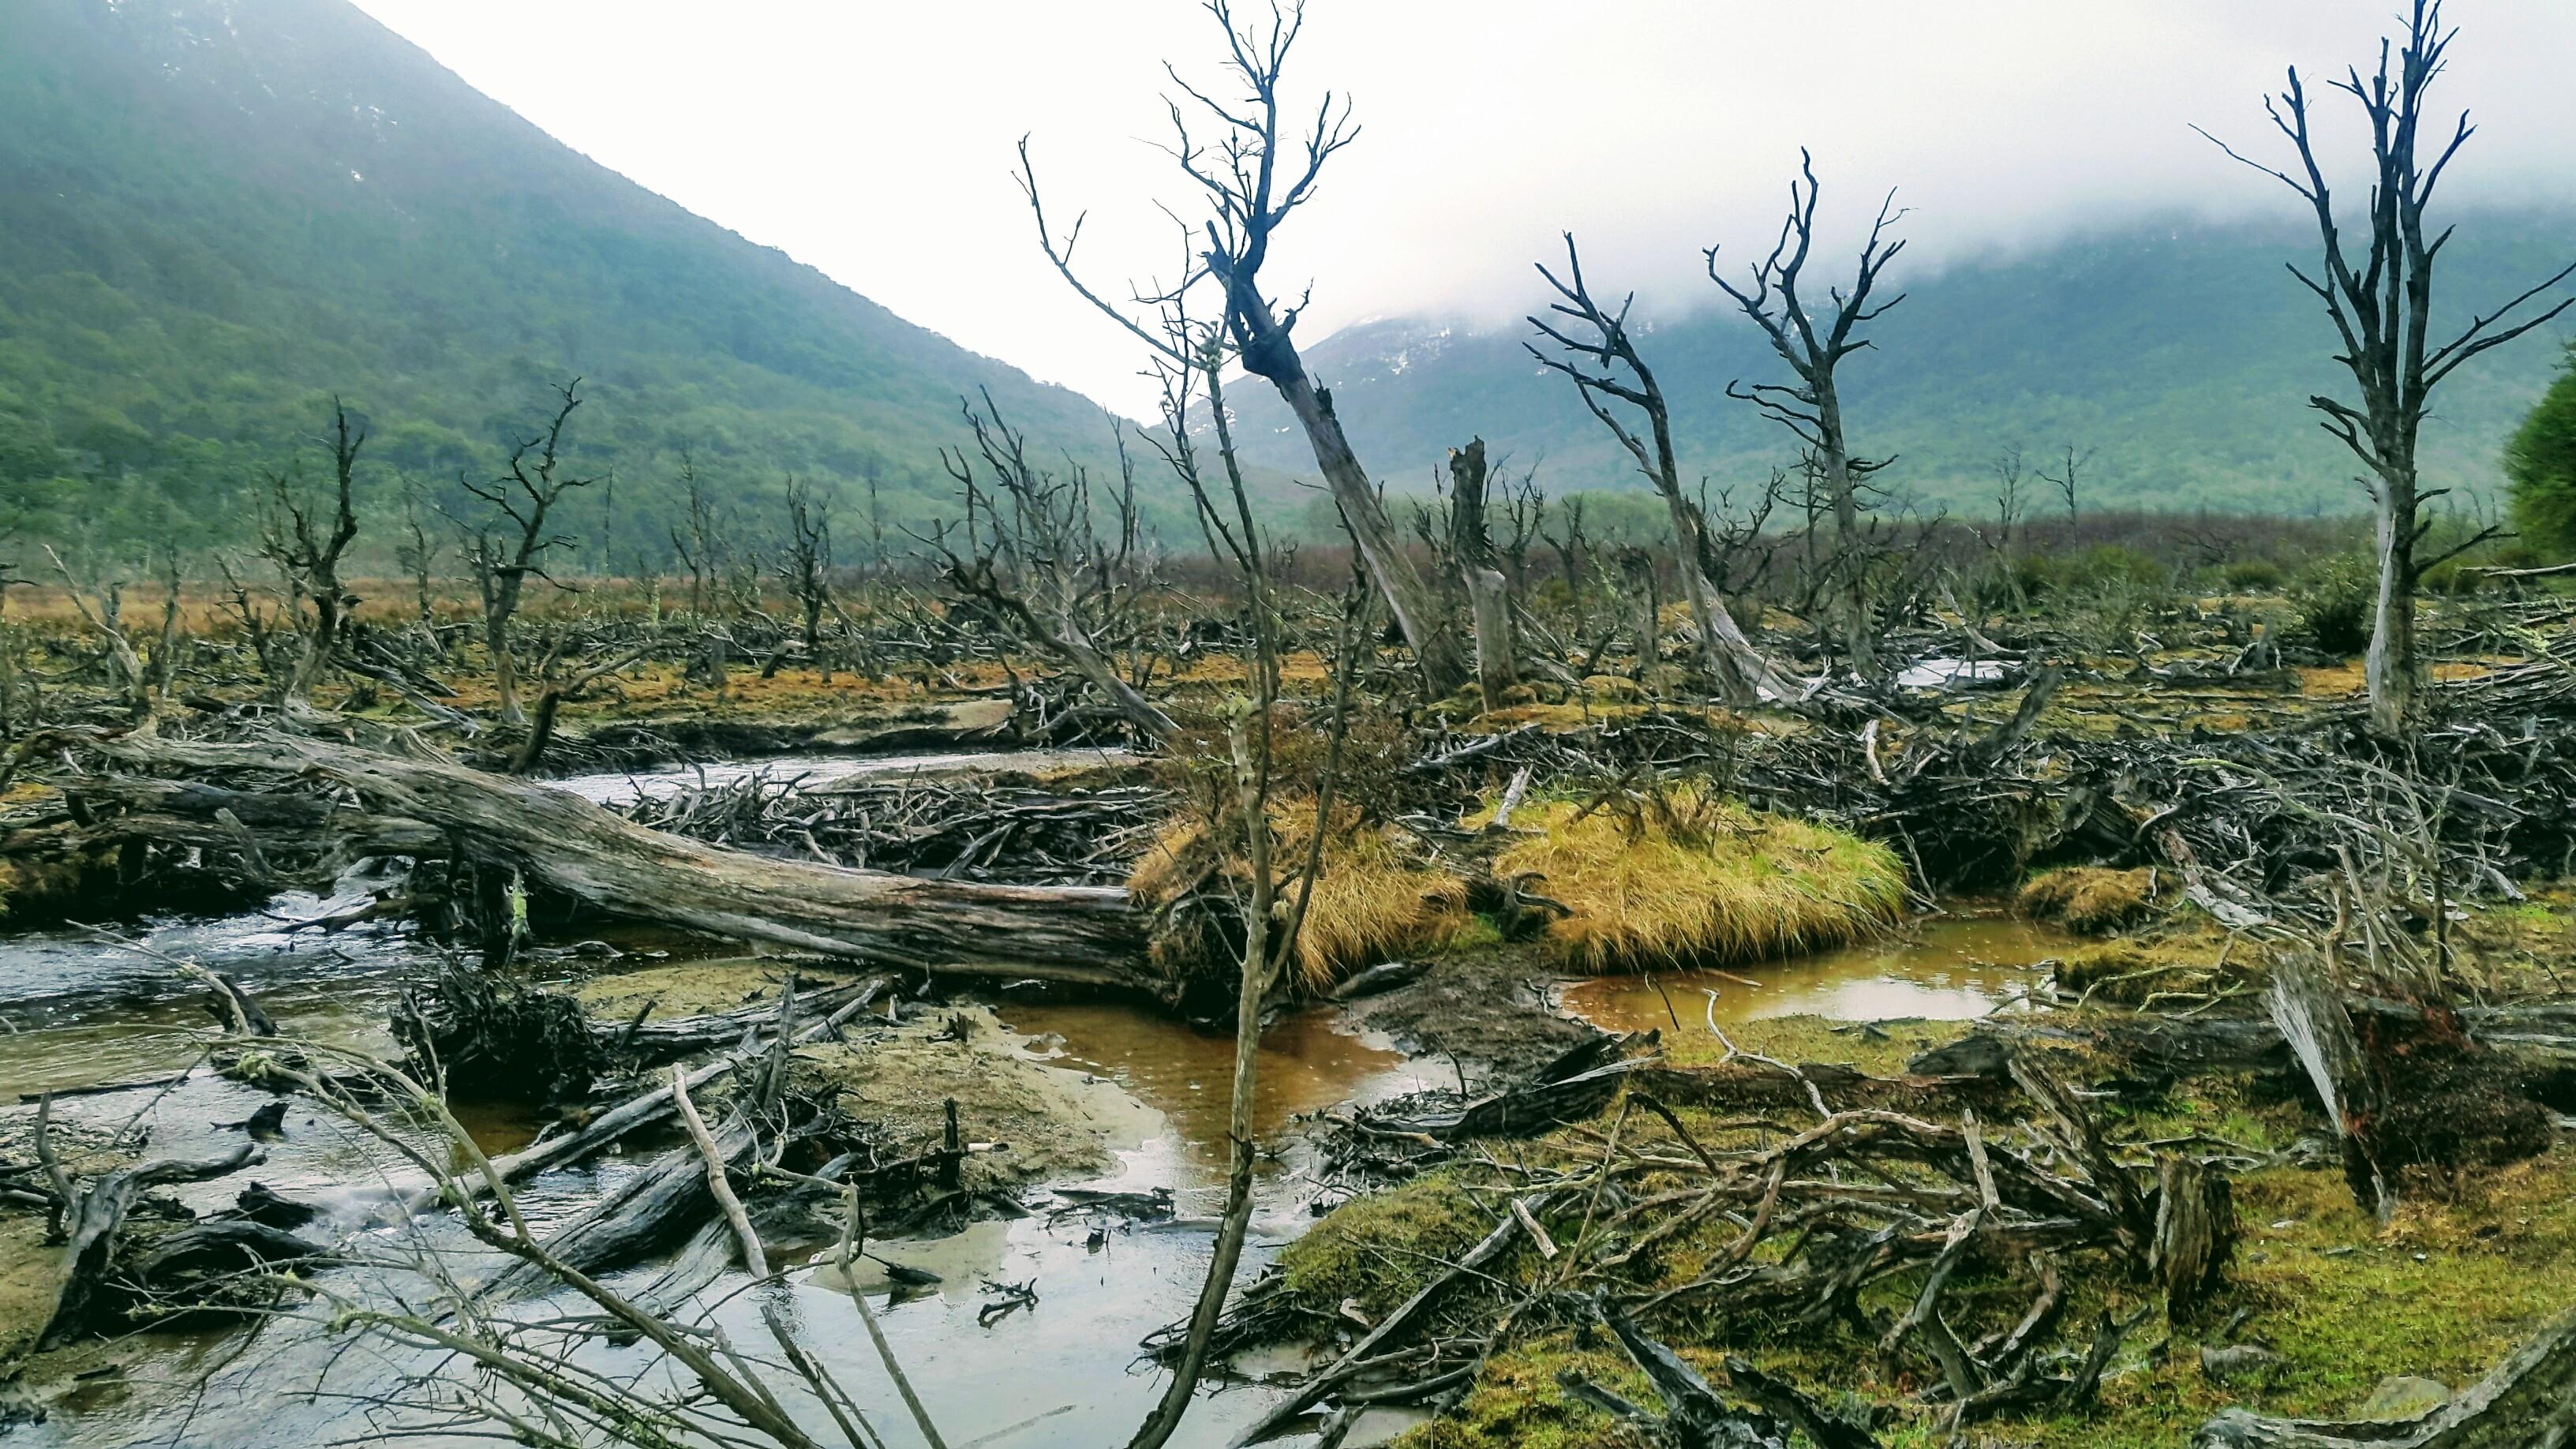 Ruinated landscapes of imperial failed adaptations. © 2018 Mara Dicenta.